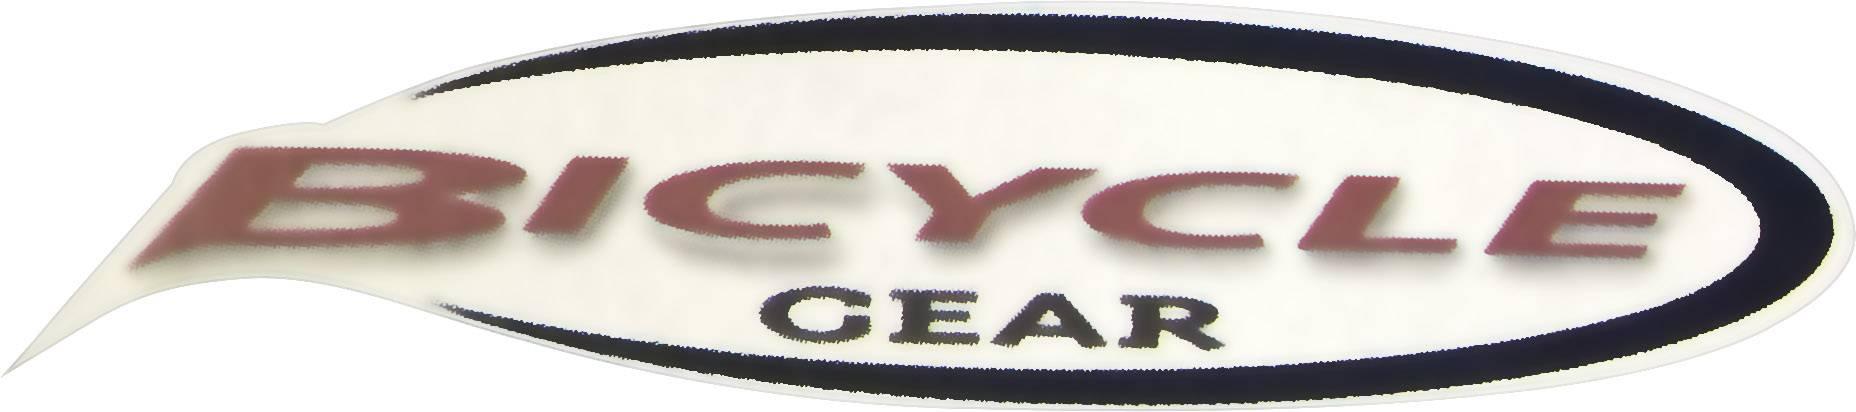 Bicyle Gear